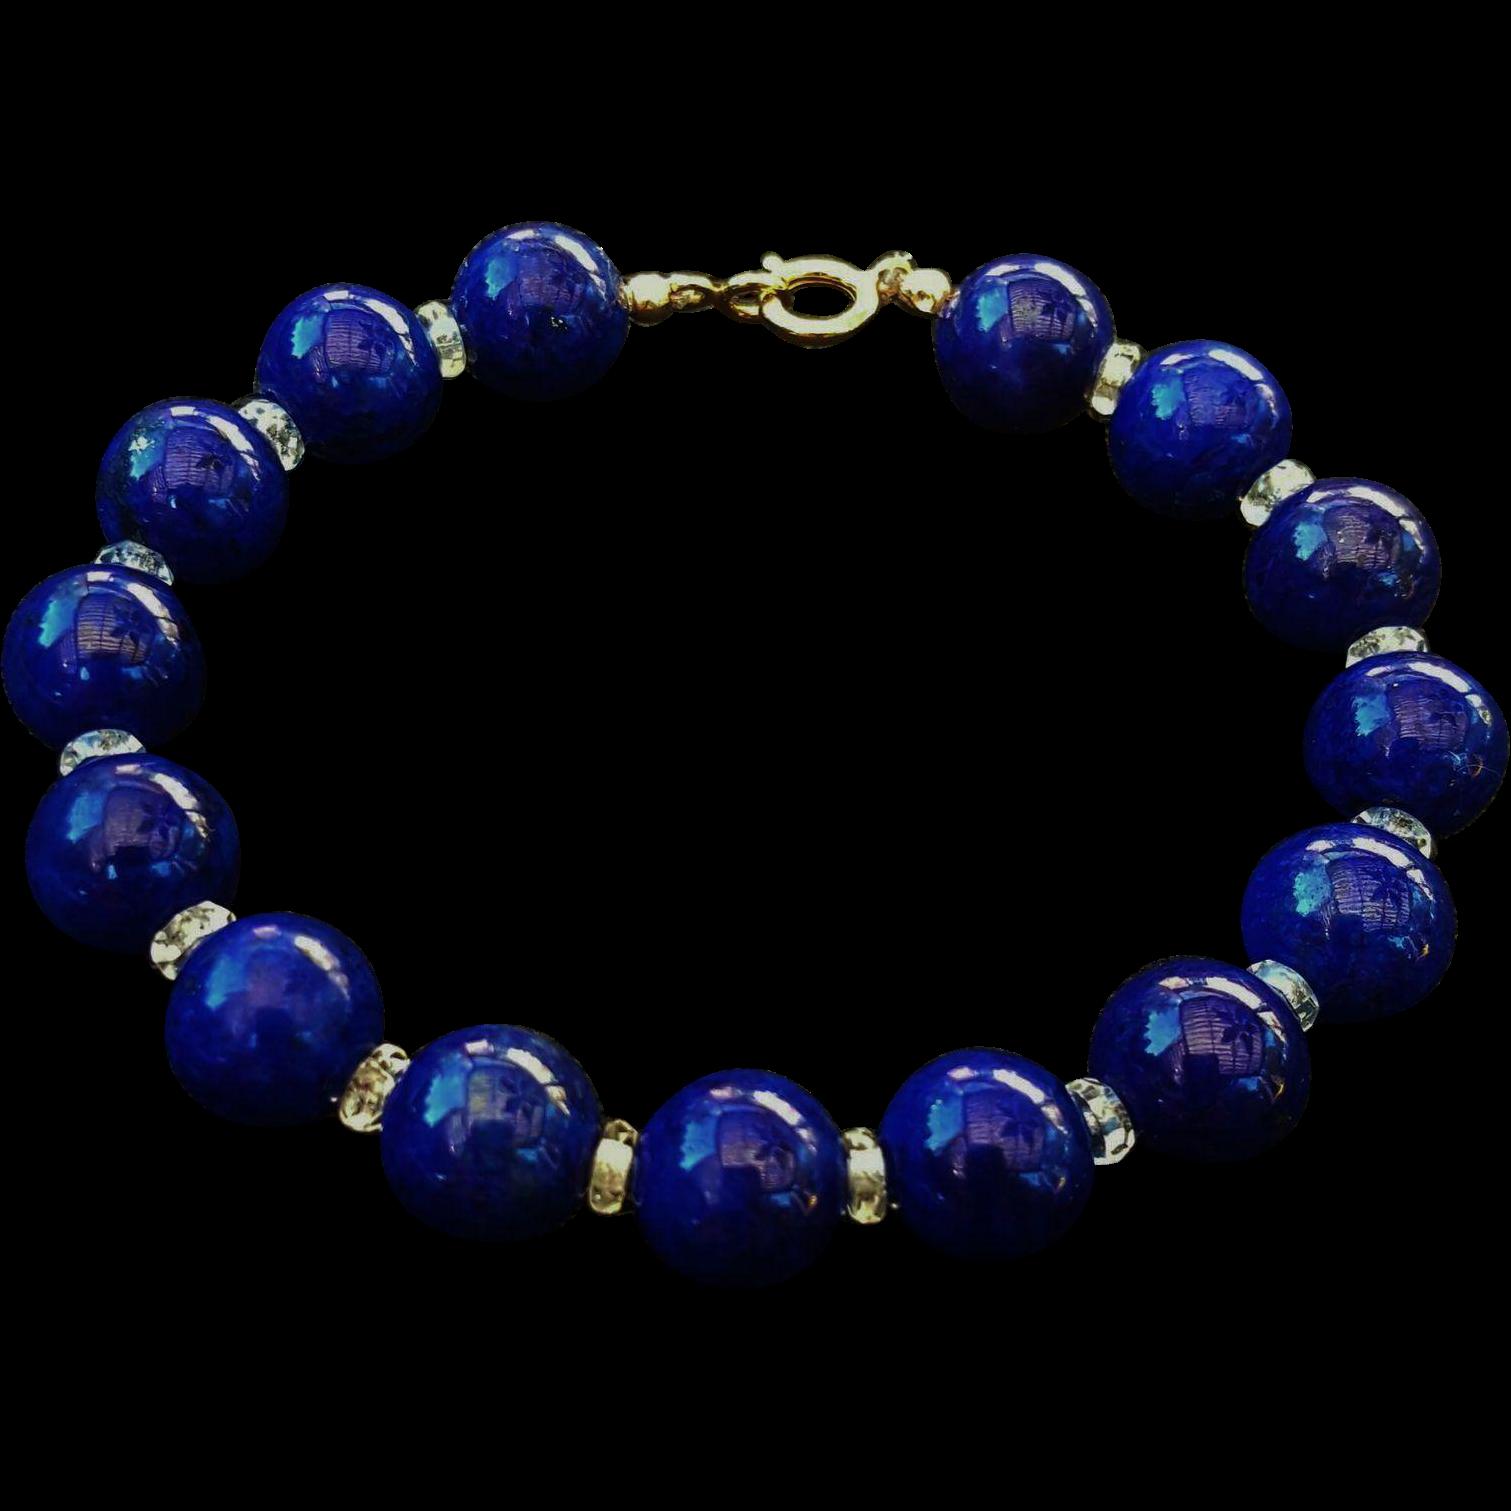 vintage 14k lapis lazuli bracelet crystal spacers from jools4u on ruby lane. Black Bedroom Furniture Sets. Home Design Ideas